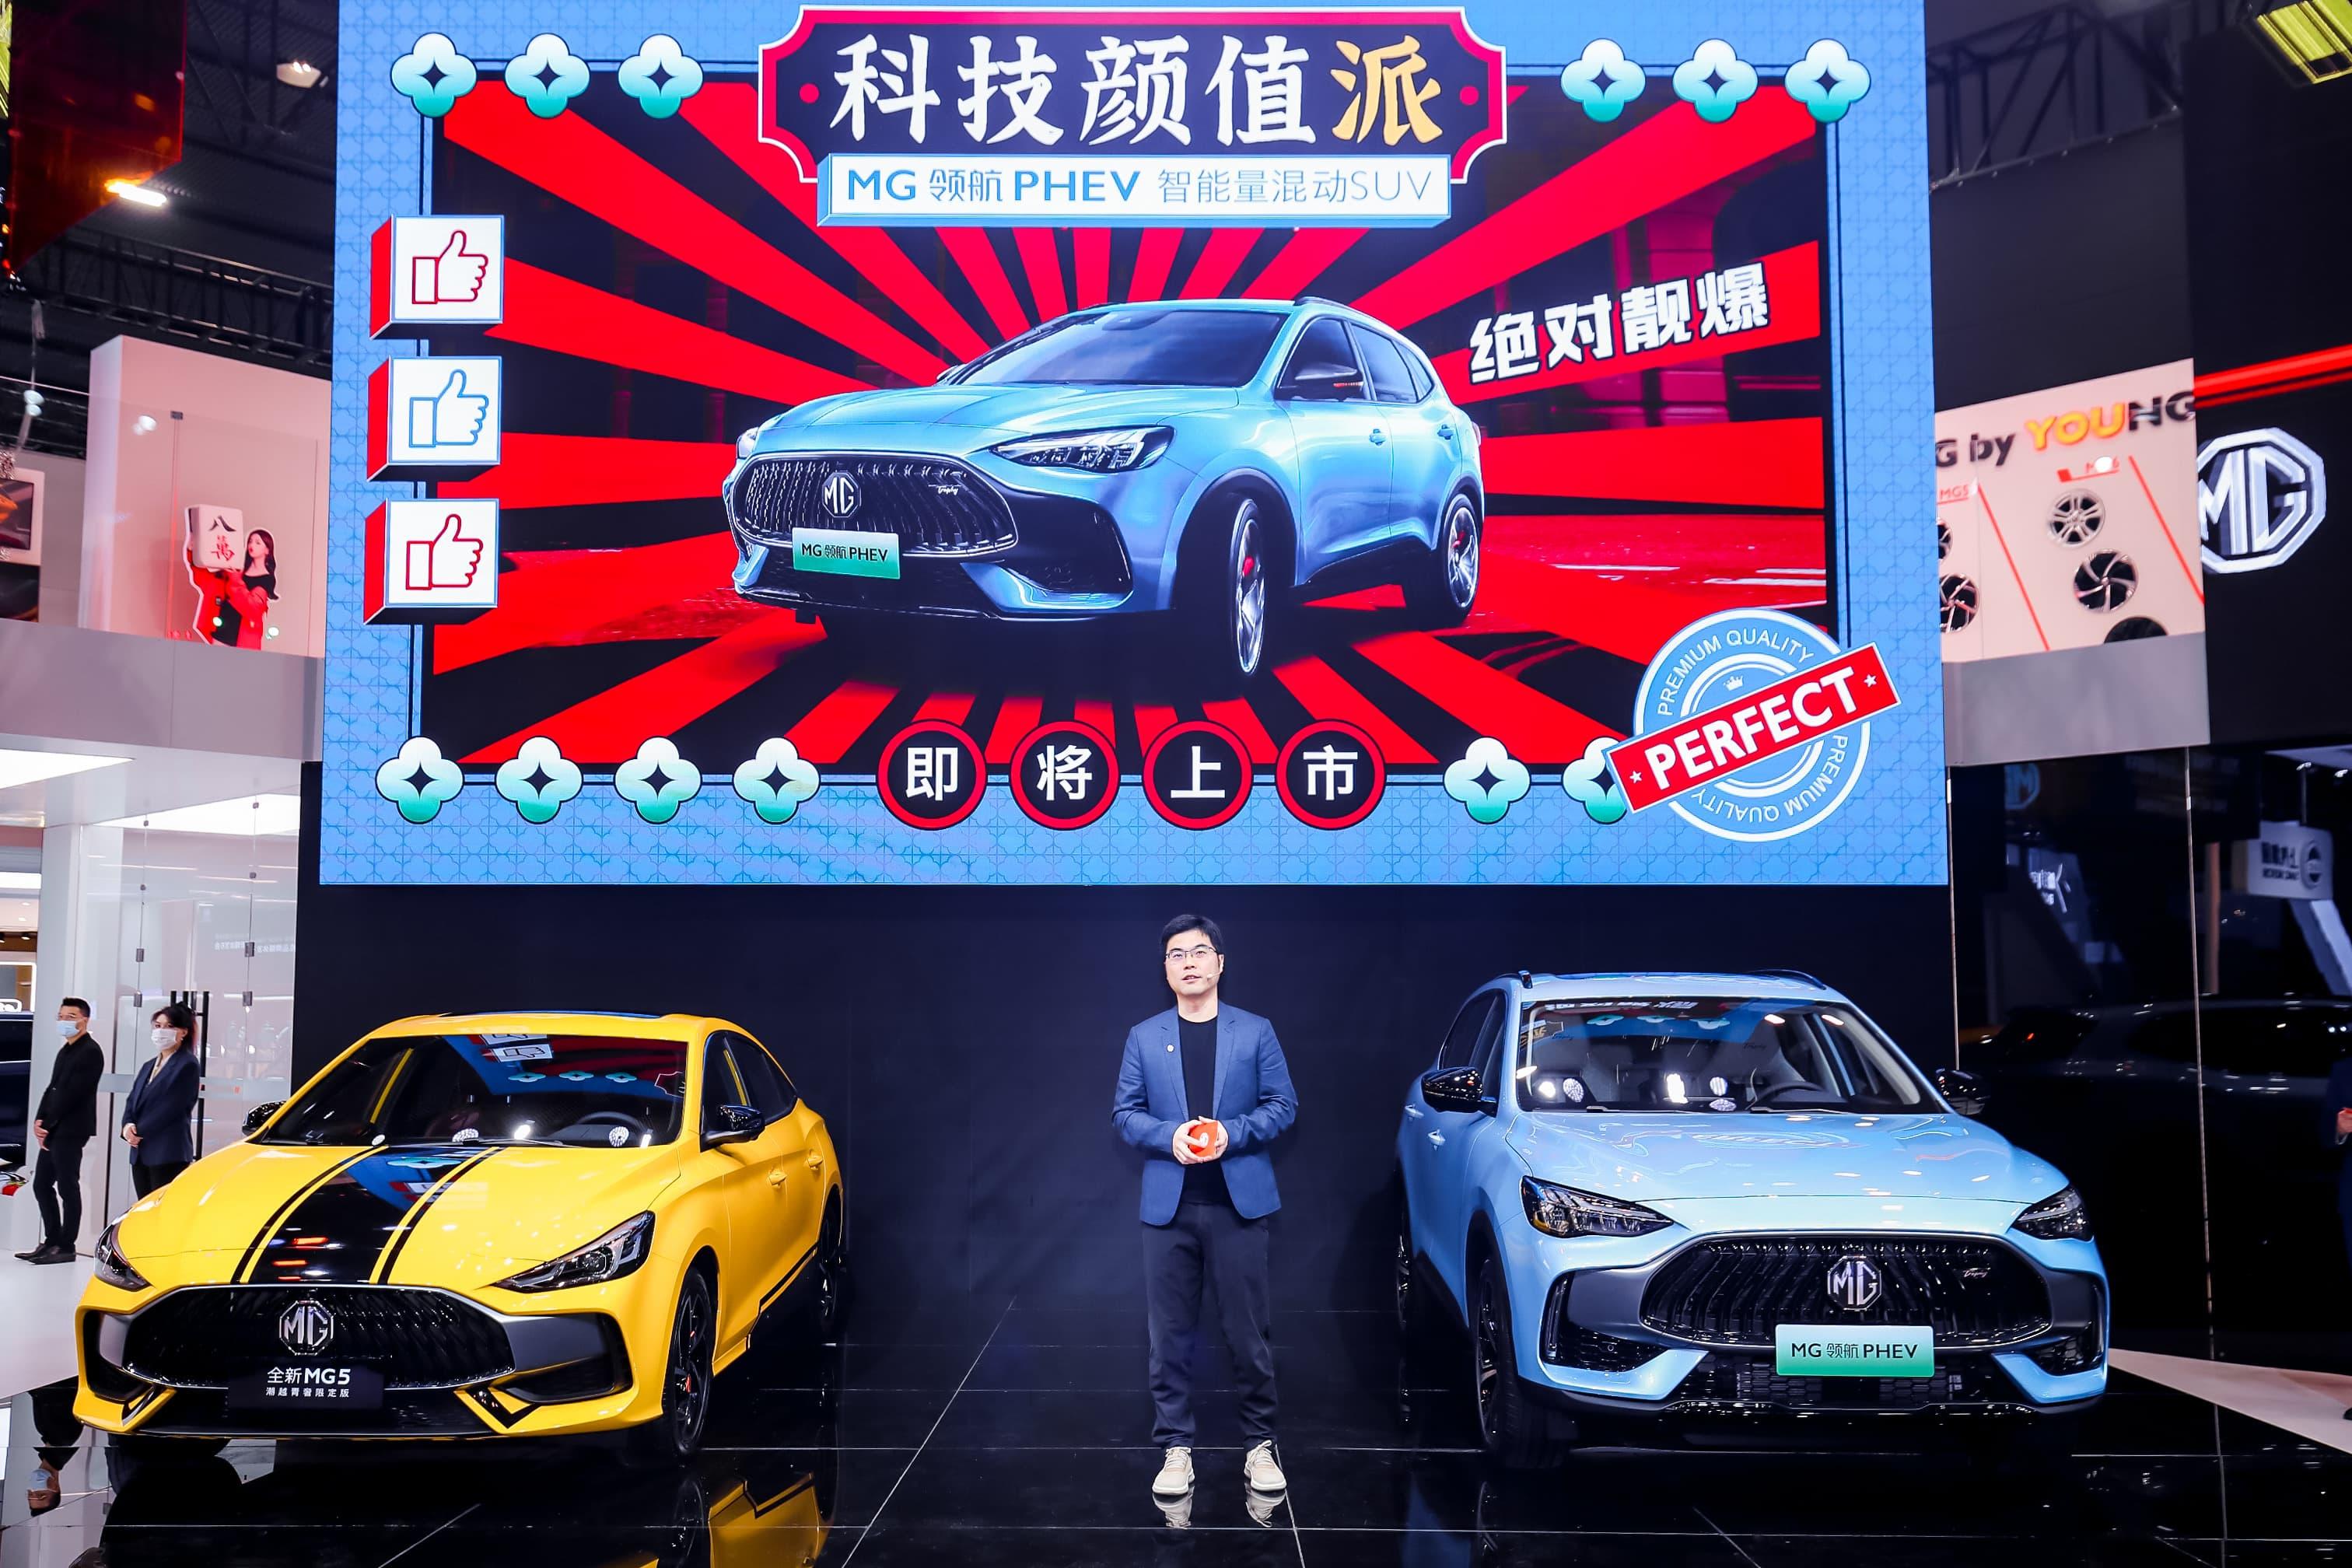 MG领航PHEV于广州车展首秀,即将上市